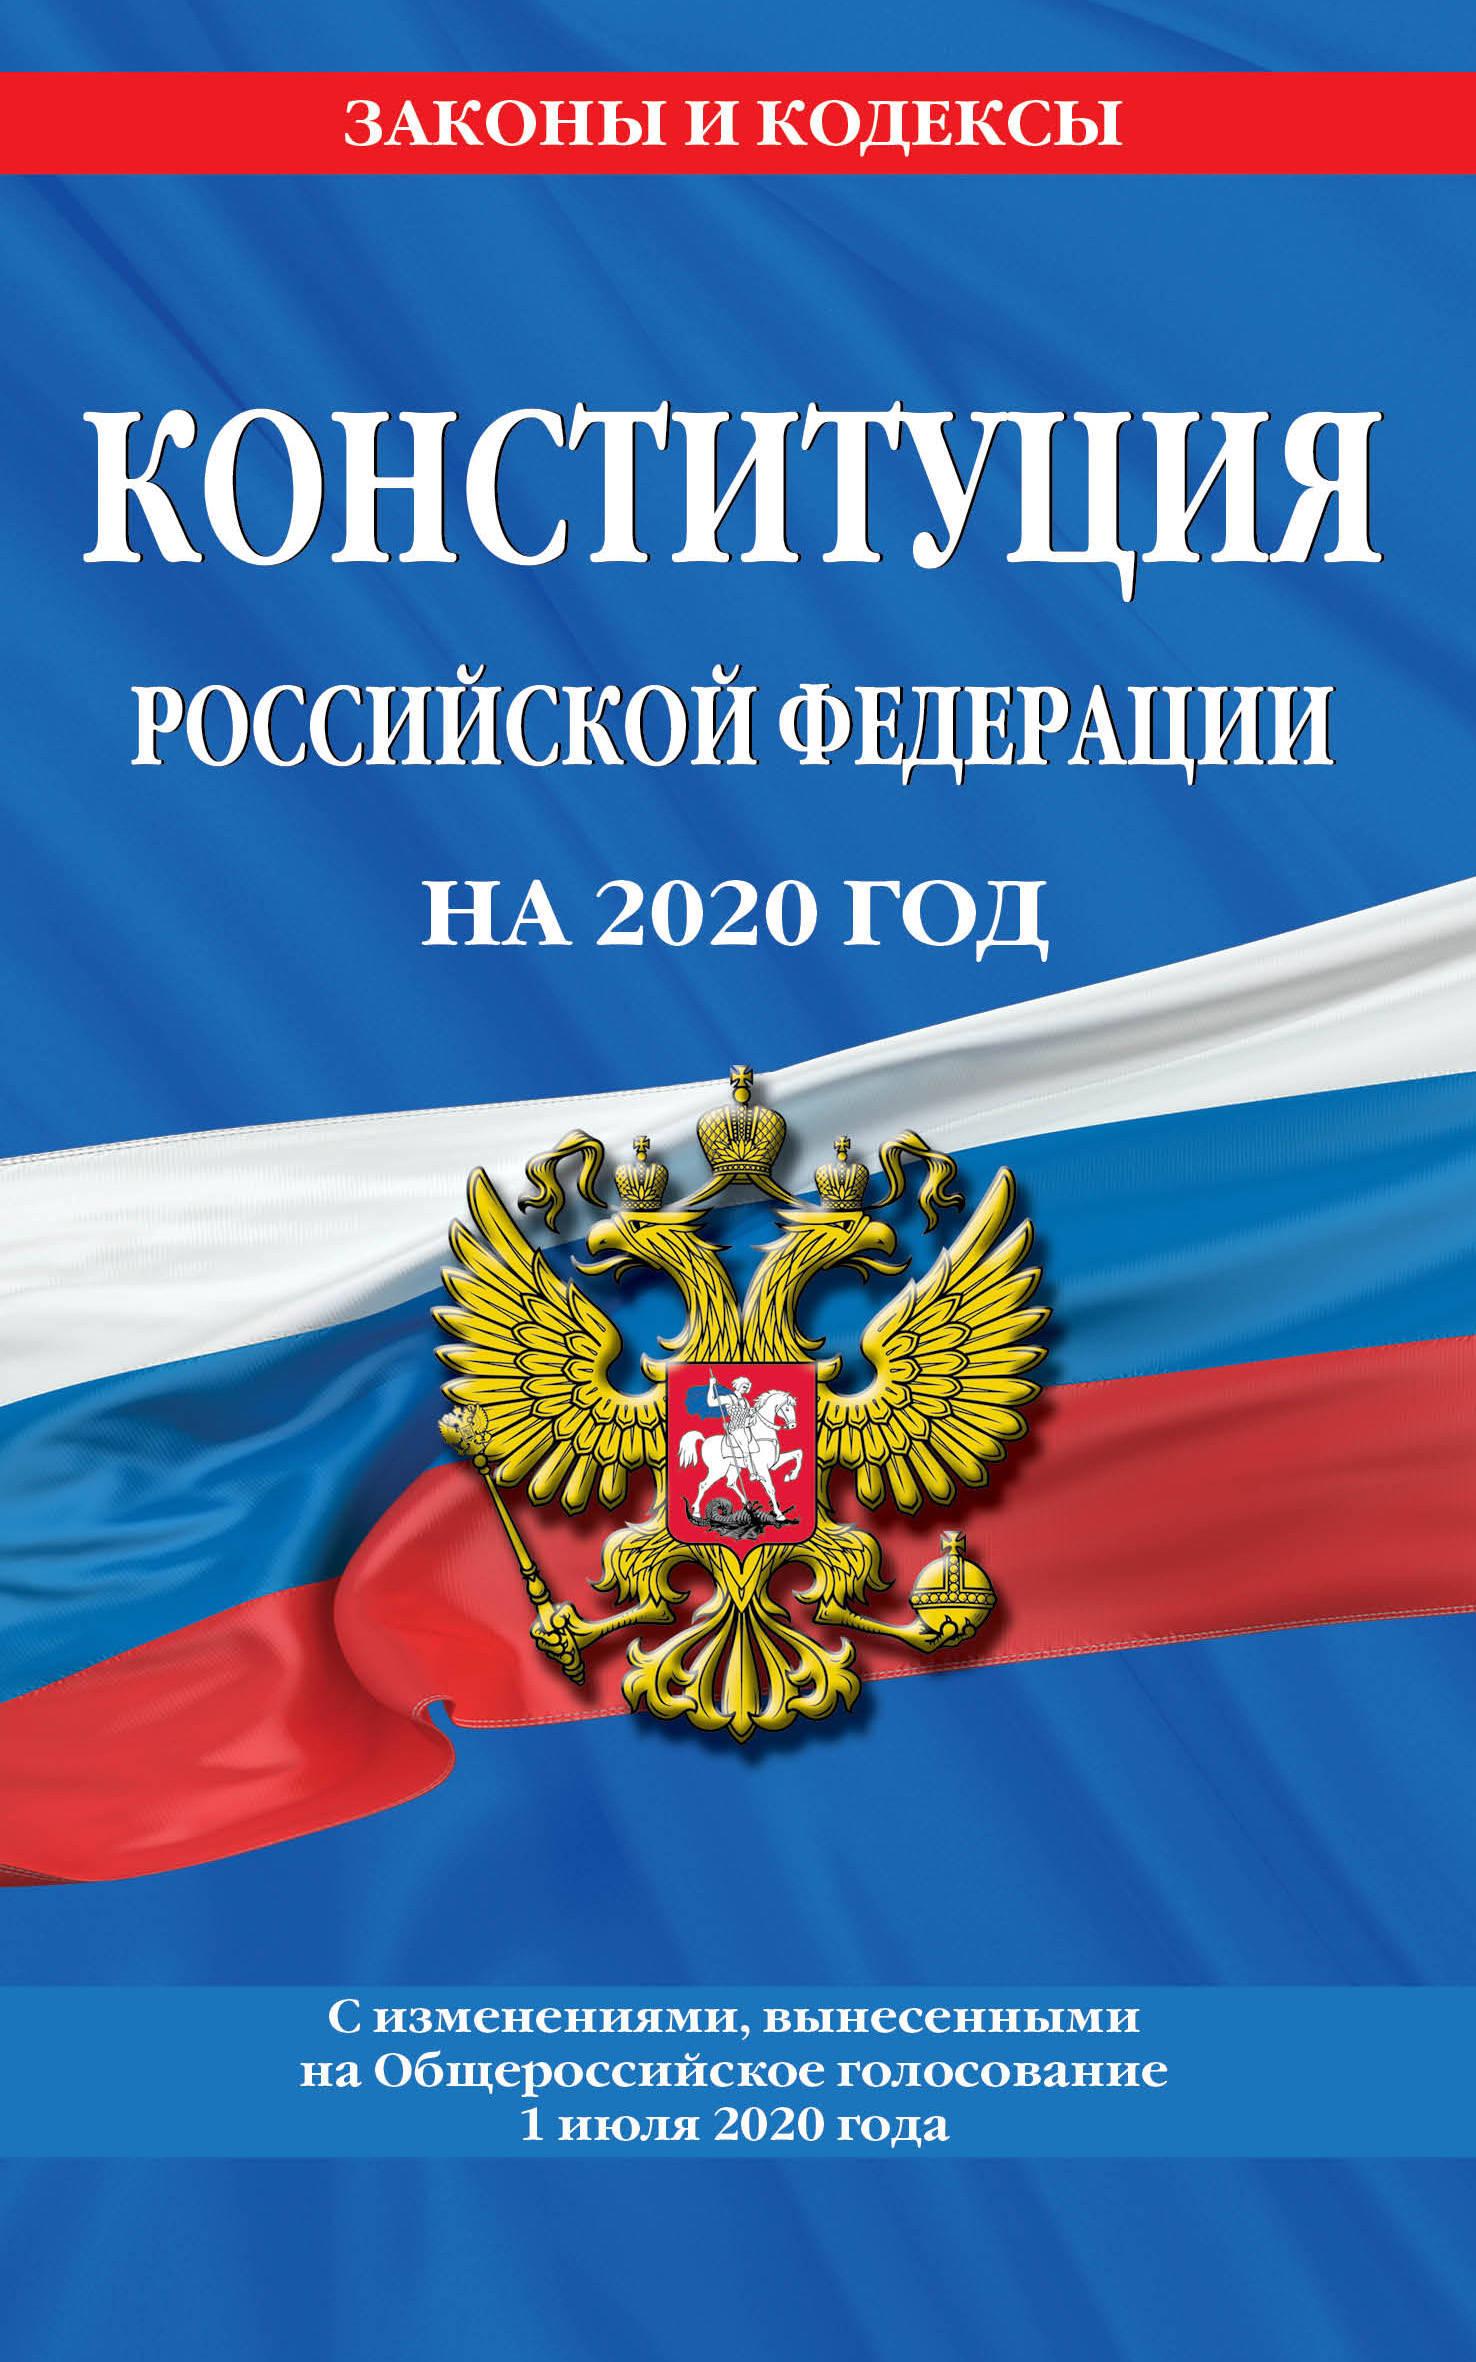 Konstitutsija Rossijskoj Federatsii s izmenenijami, vynesennymi na Obscherossijskoe golosovanie 1 ijulja 2020 goda (redaktsija 2020 g.)